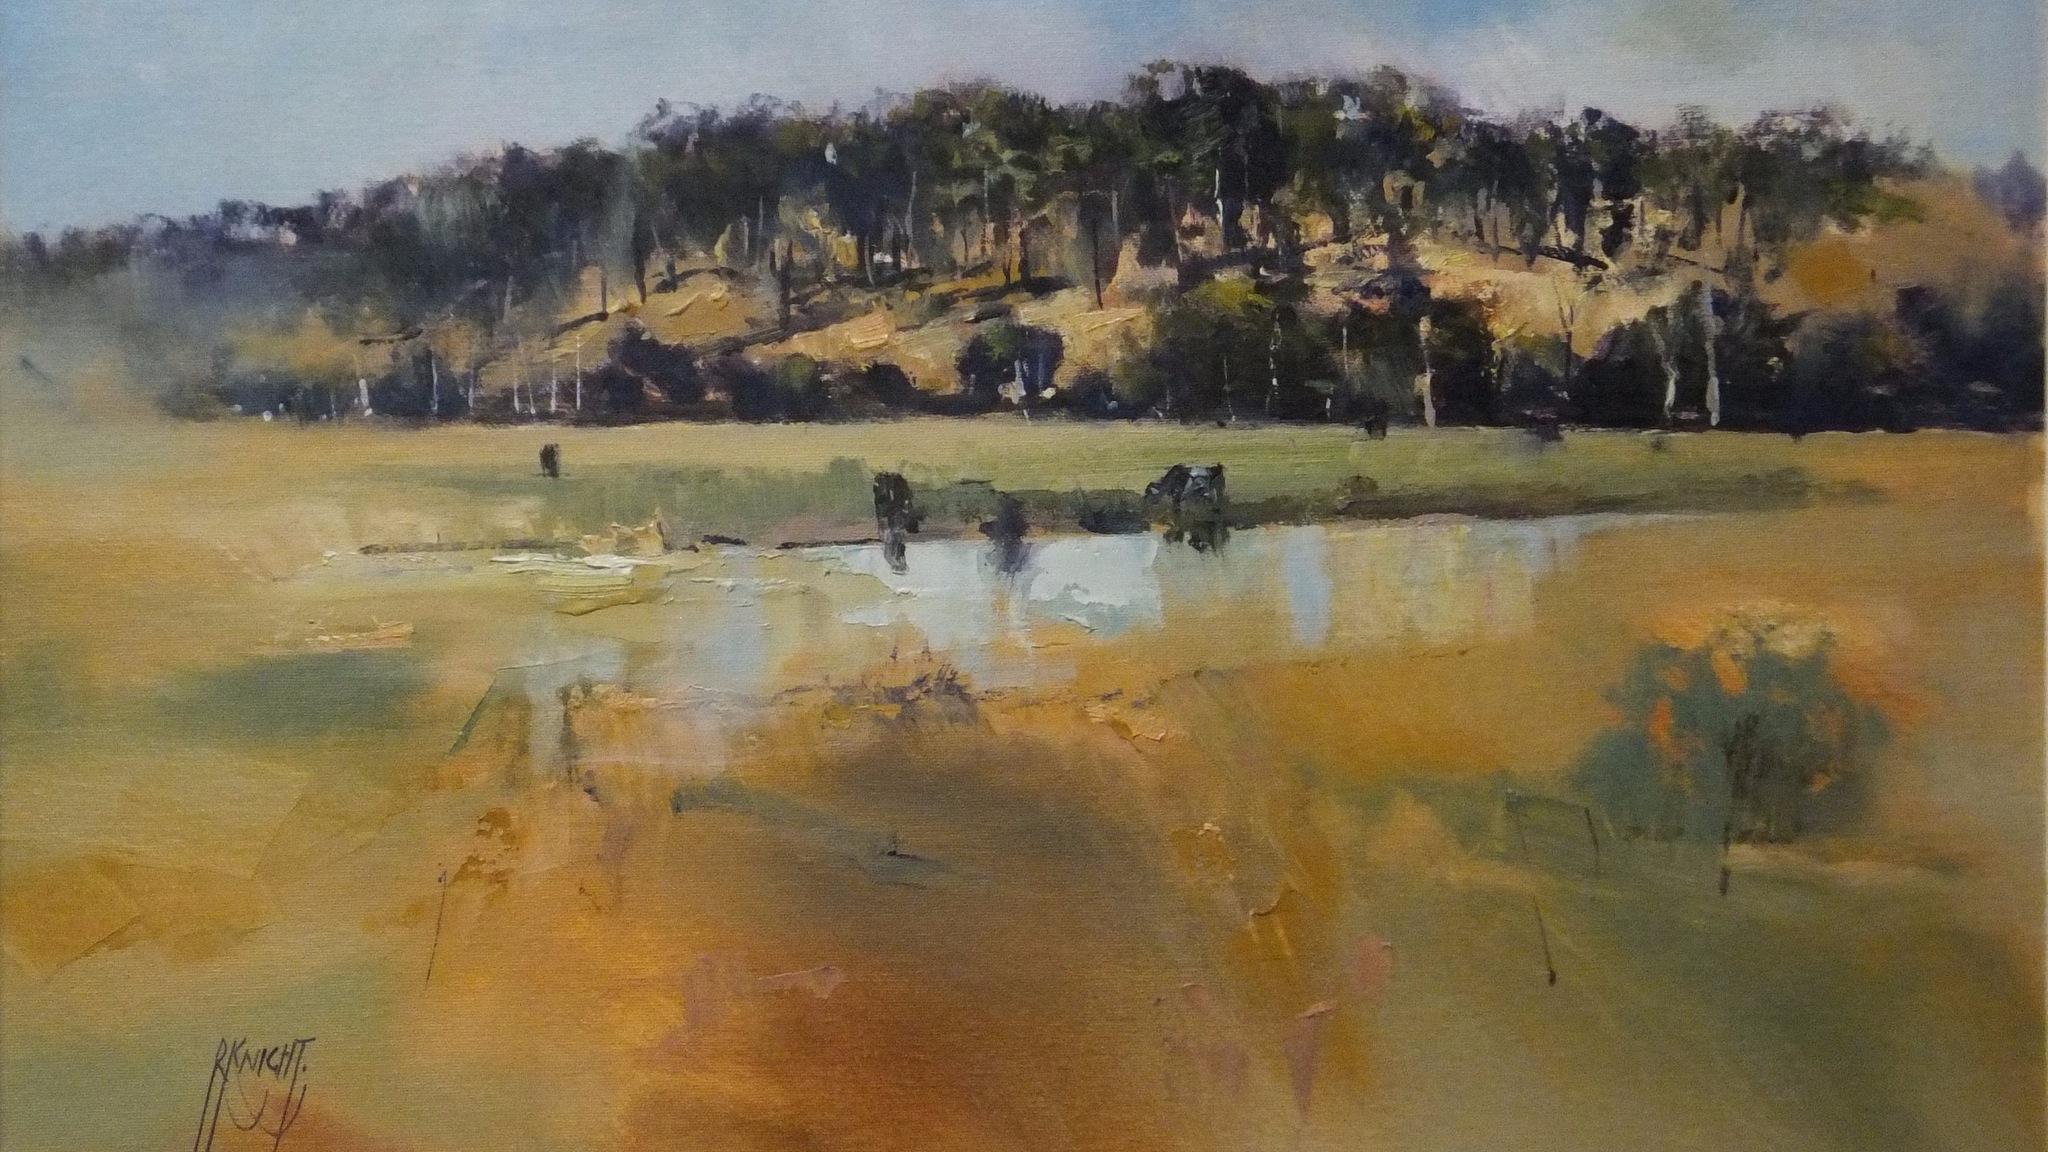 oils by Robert Knight